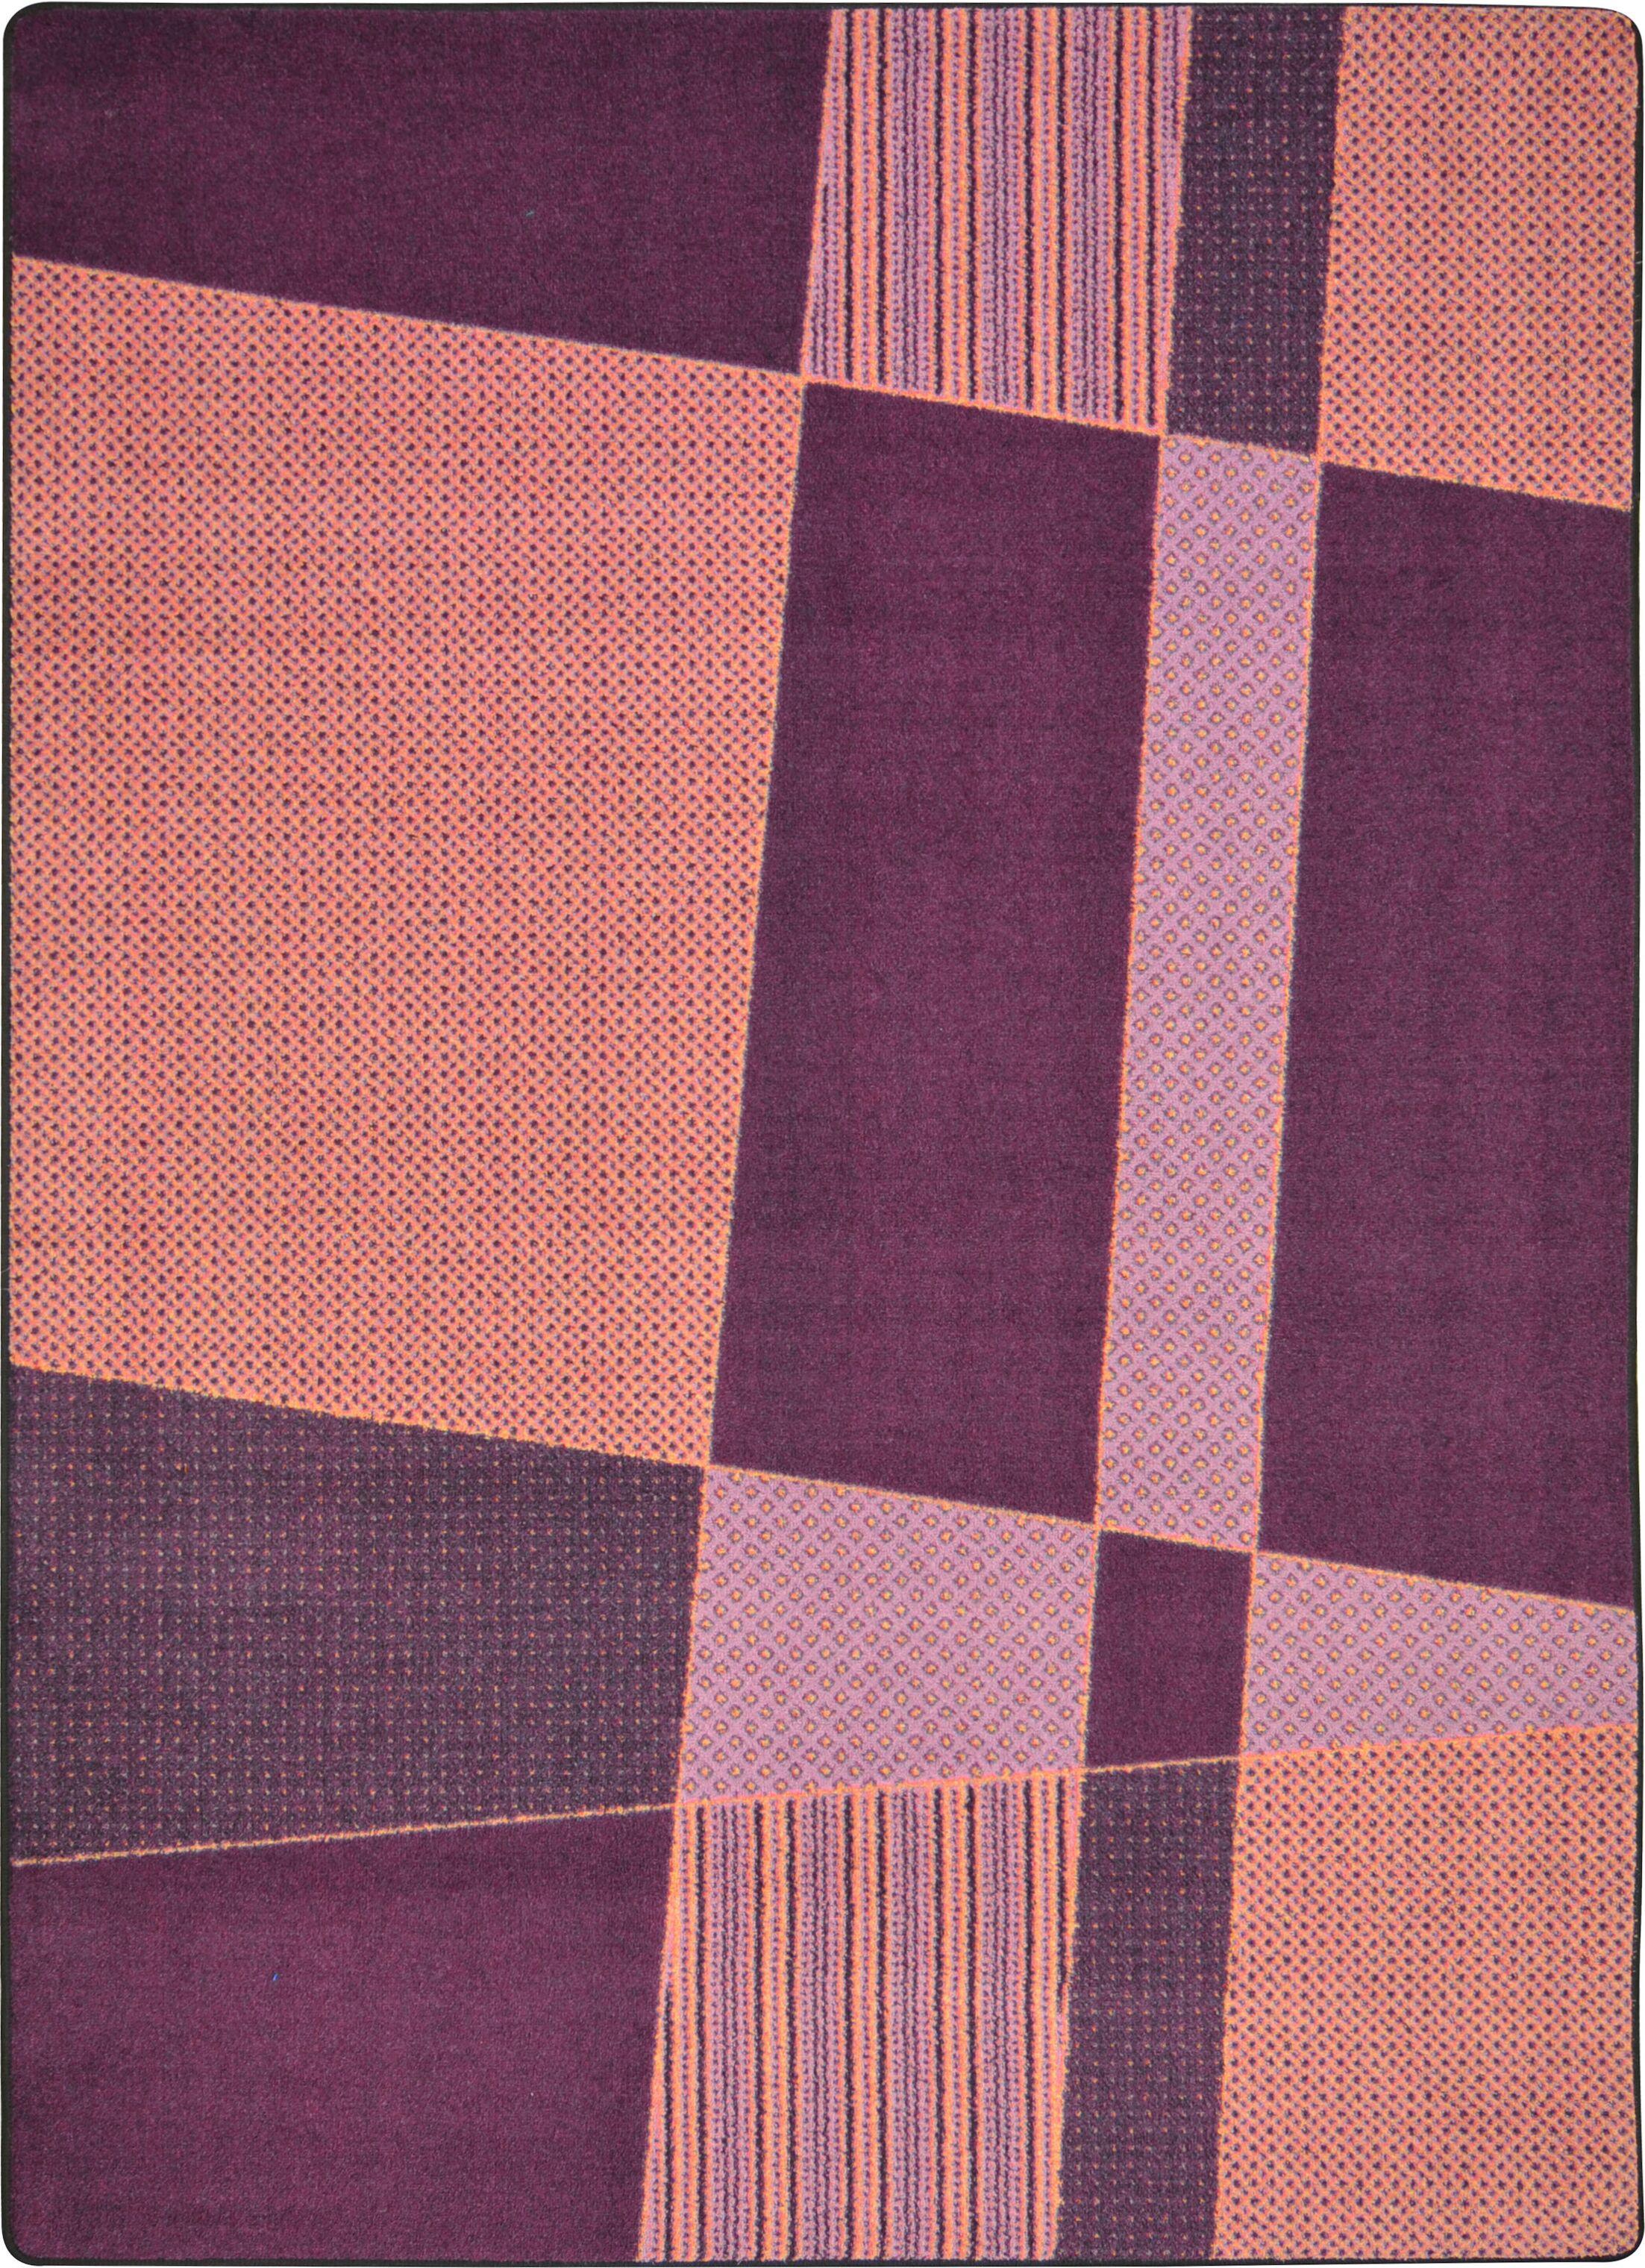 Hand-Tufled Purple/Pink Area Rug Rug Size: 3'10